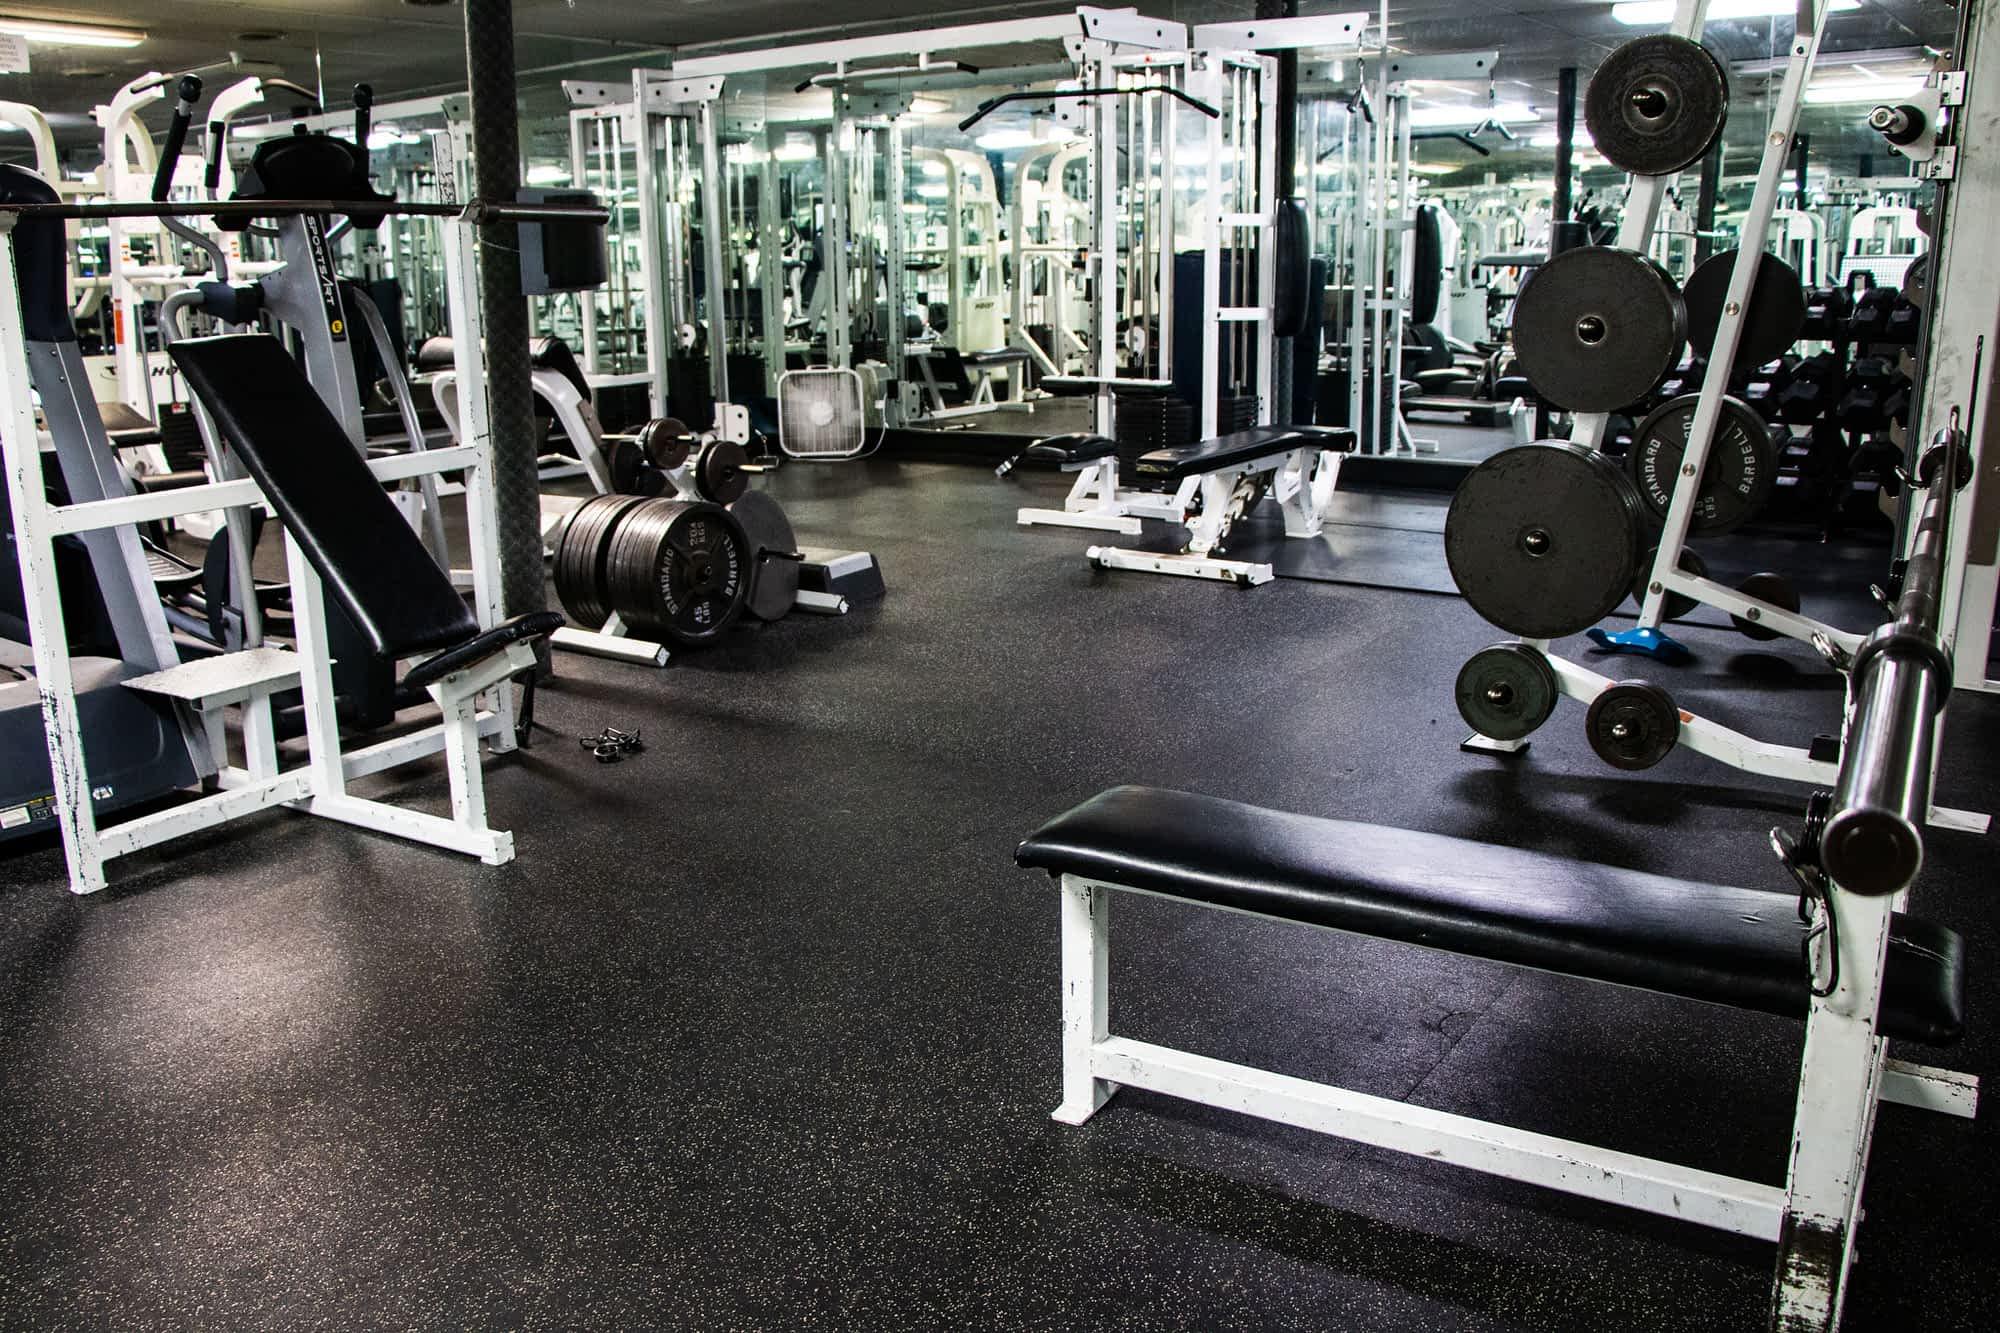 Rexburg Student Housing gym